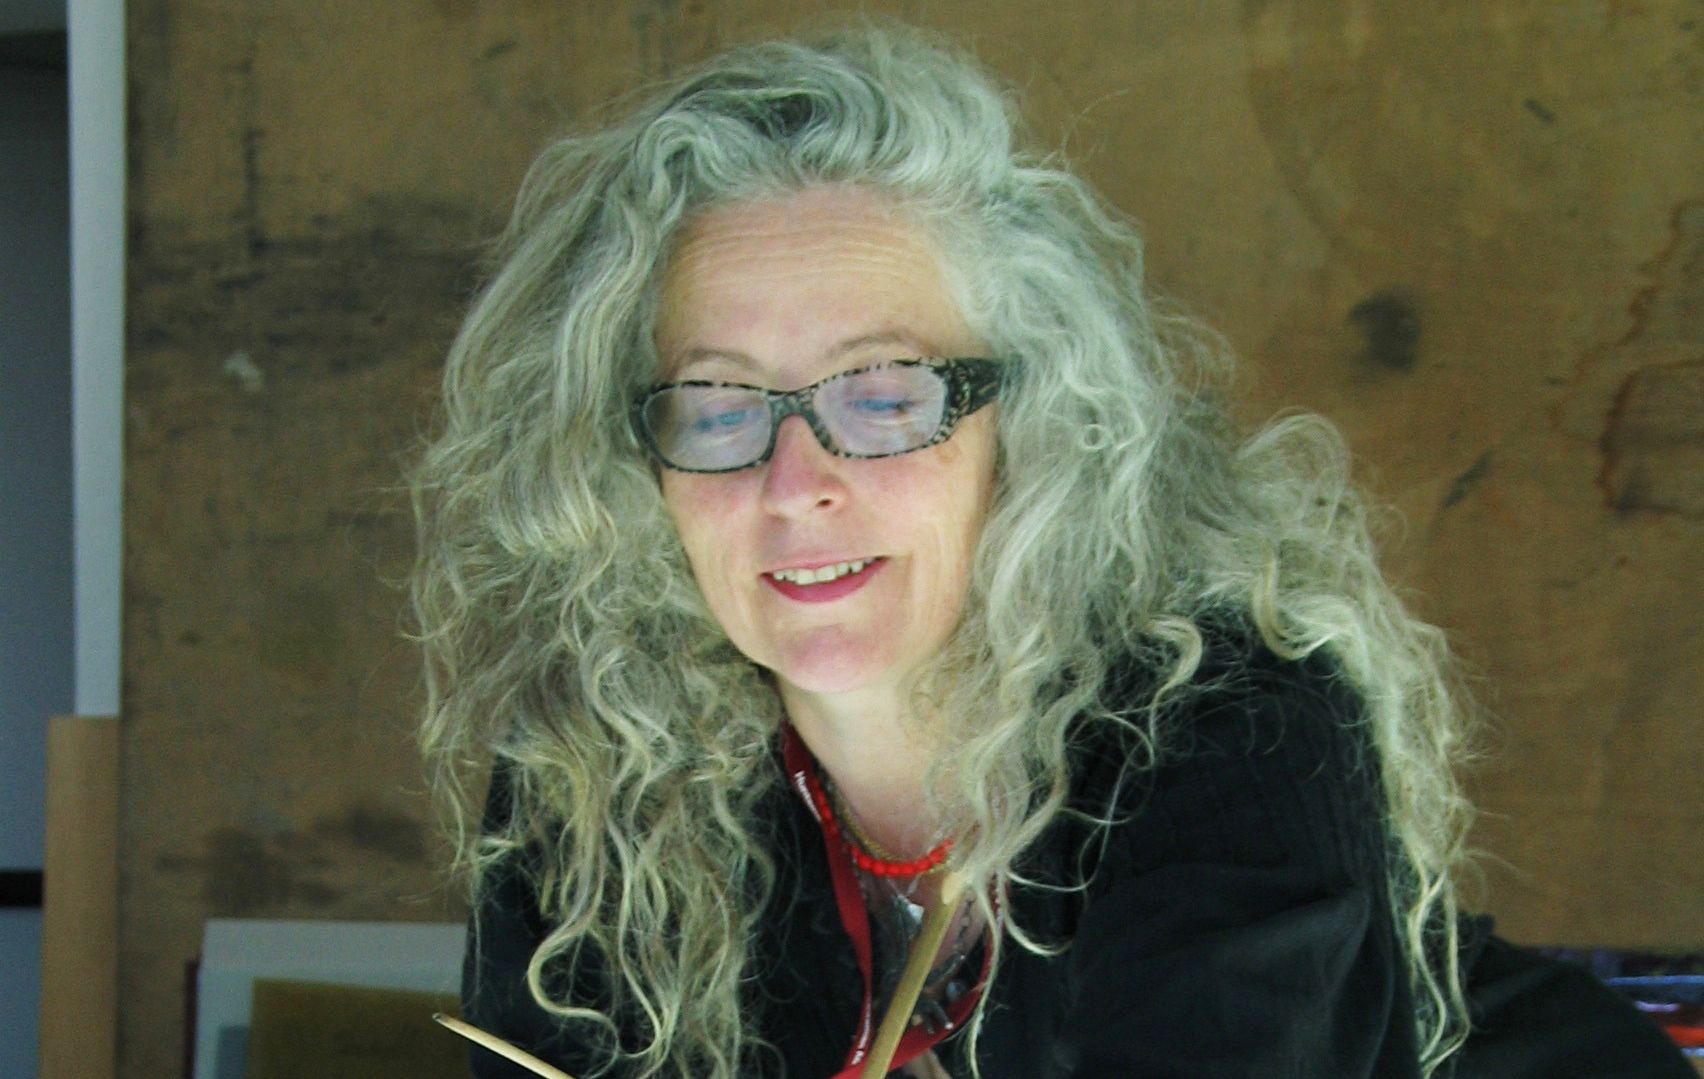 Kiki Smith: Squatting the Palace